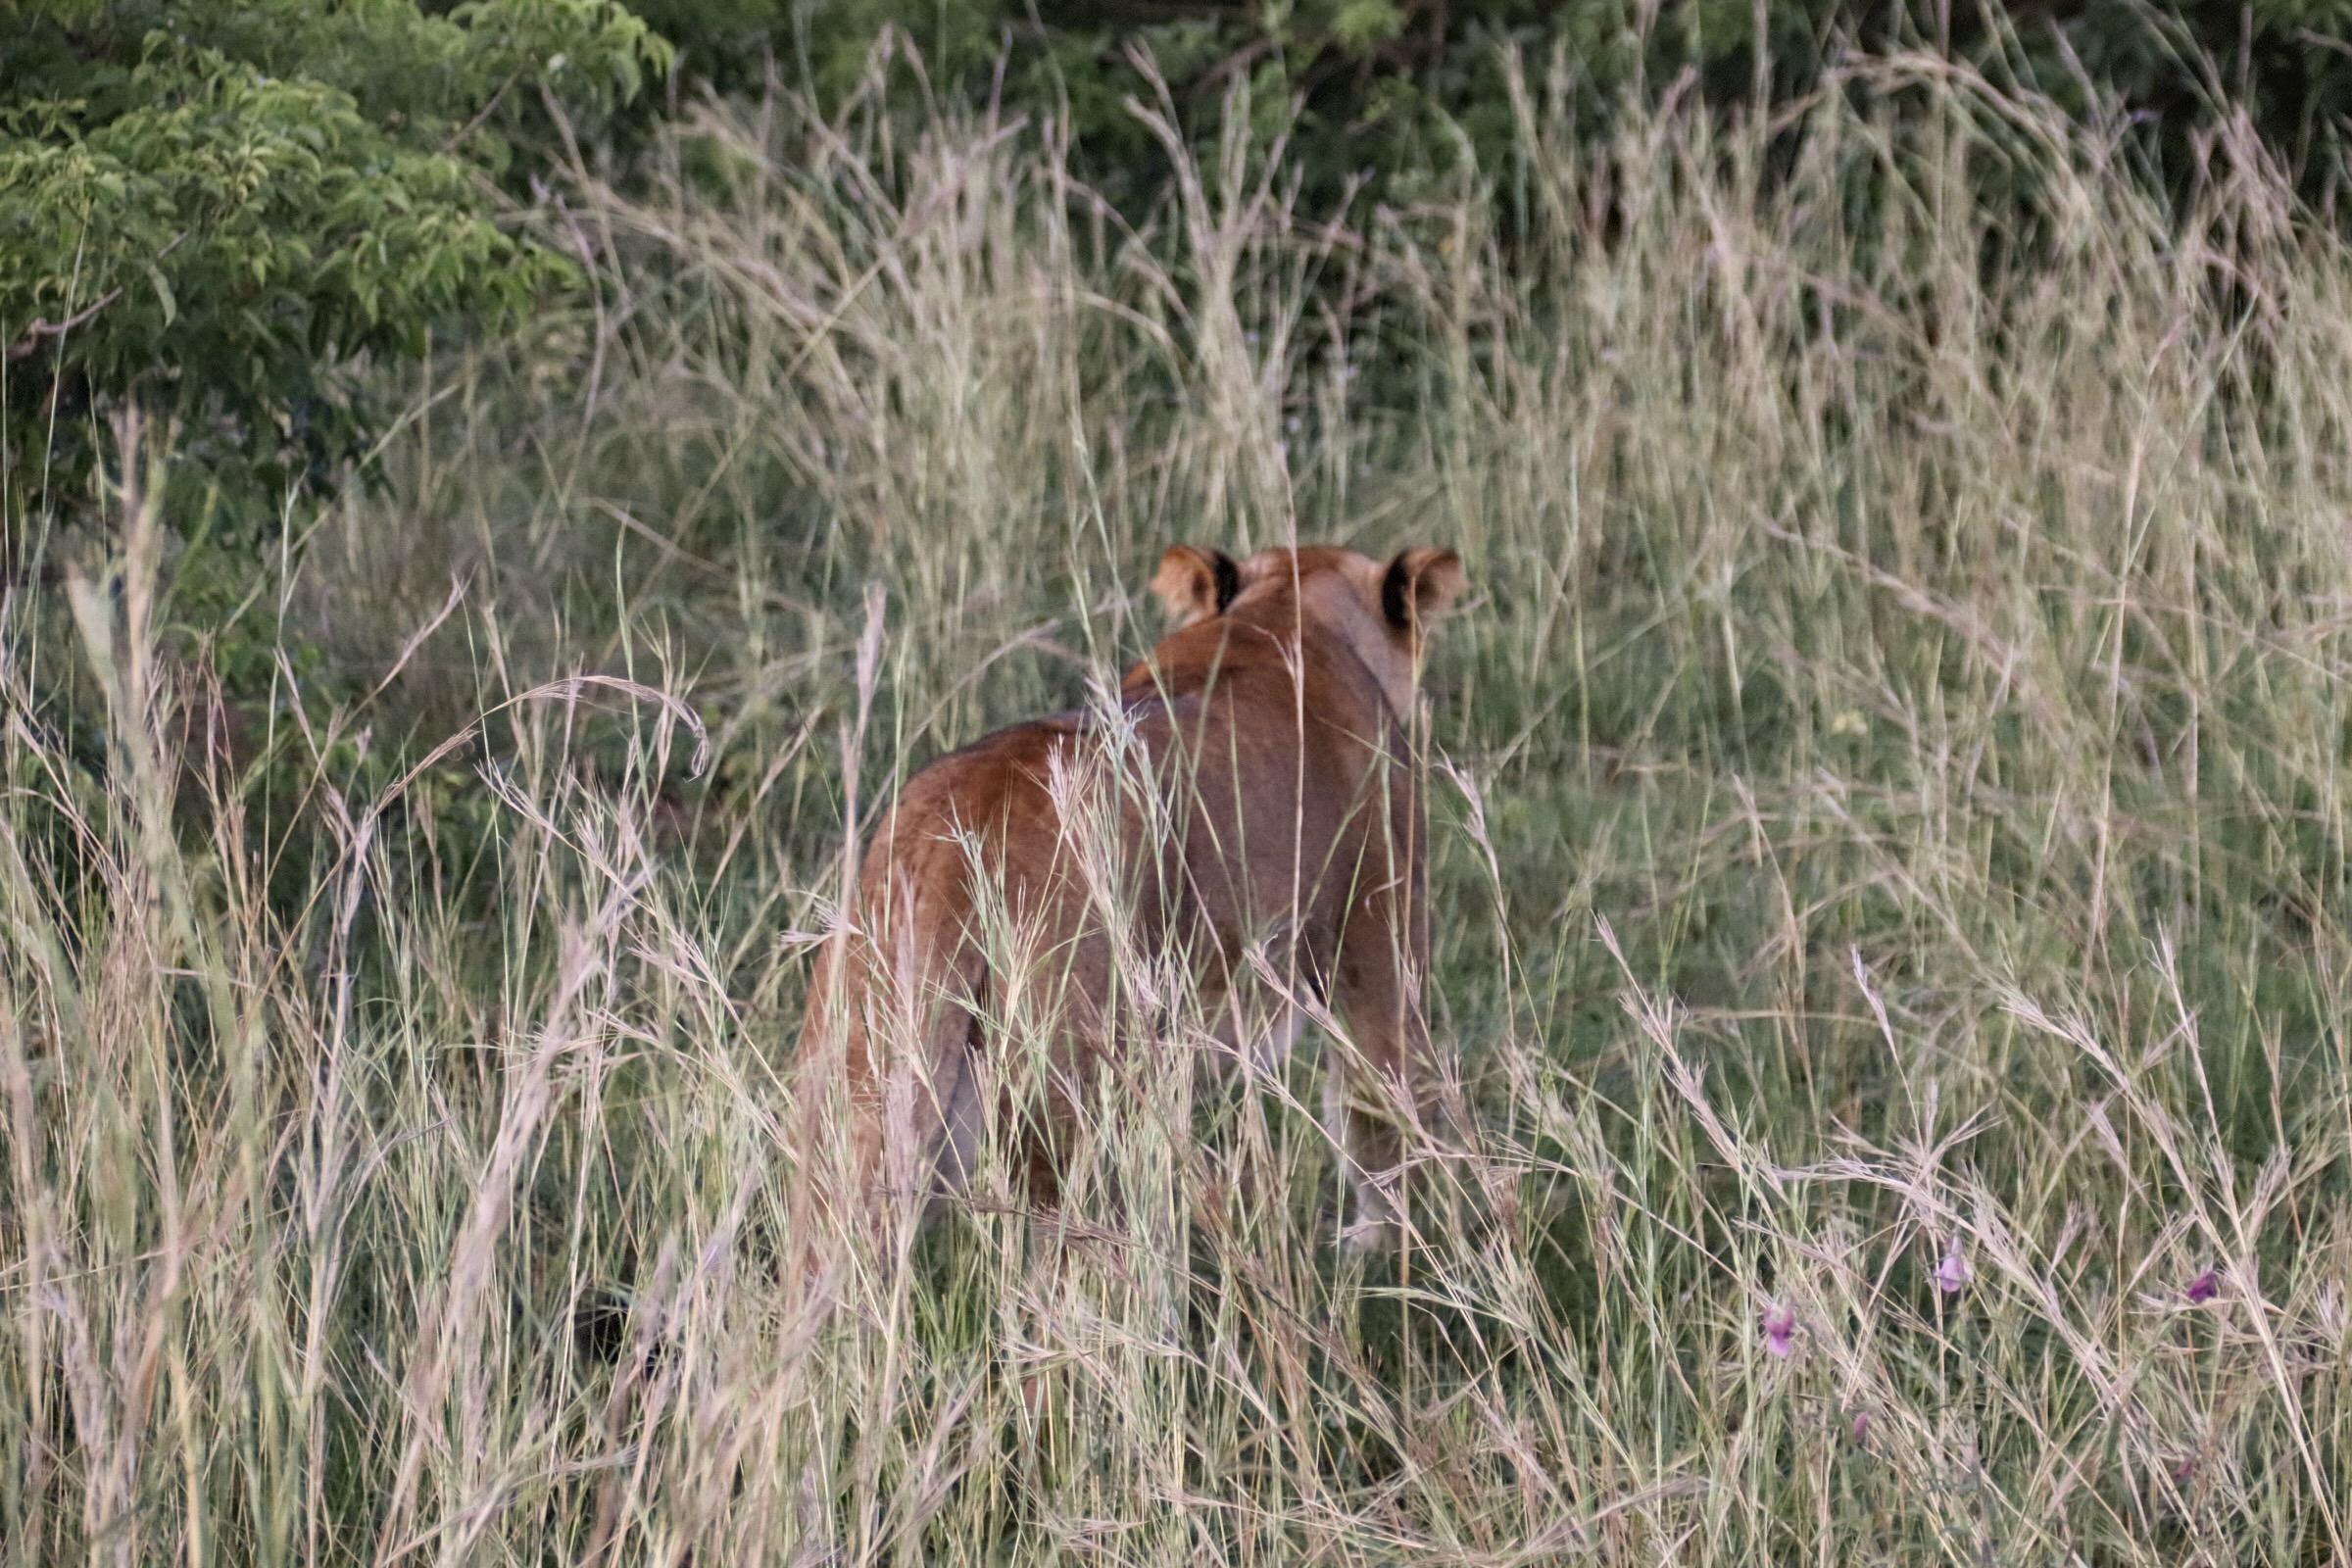 9-Day Safari Wildlife Tour Including Chimp, Gorilla Trekking 2